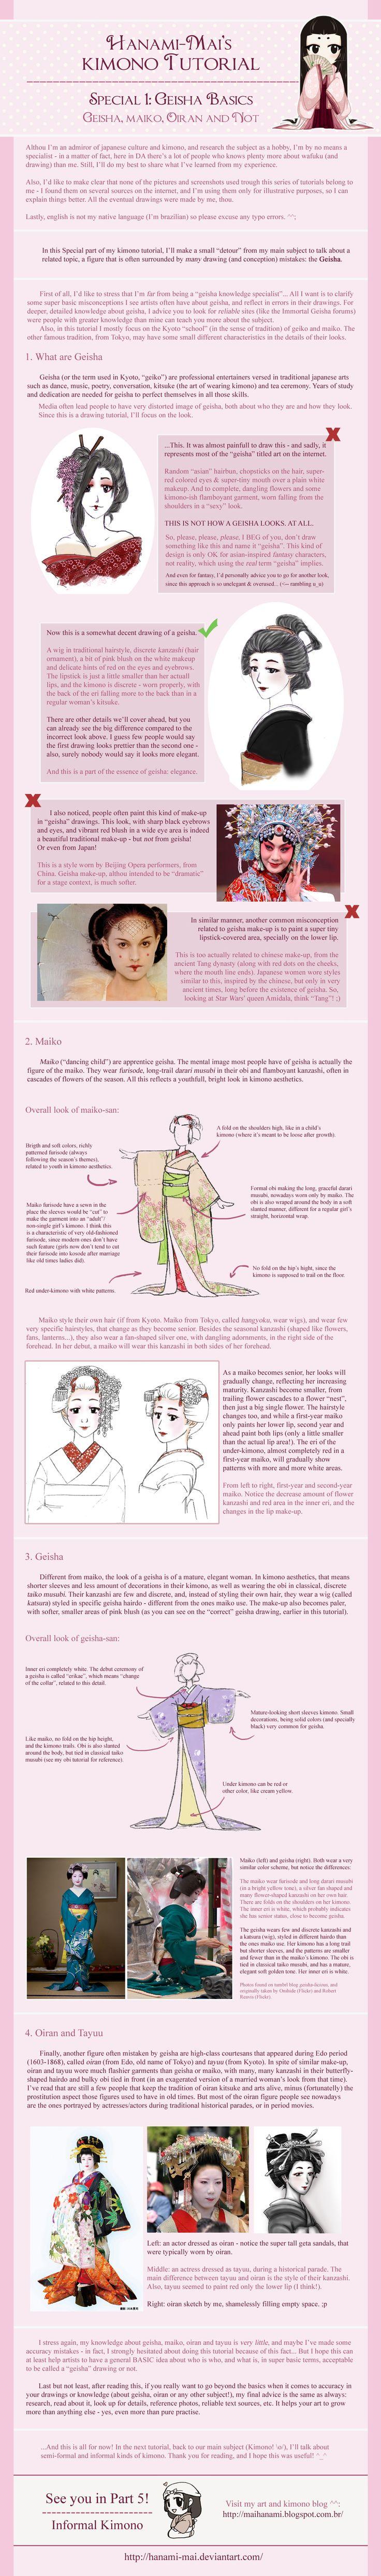 Kimono Tutorial - Geisha Special by Hanami-Mai.deviantart.com on @DeviantArt